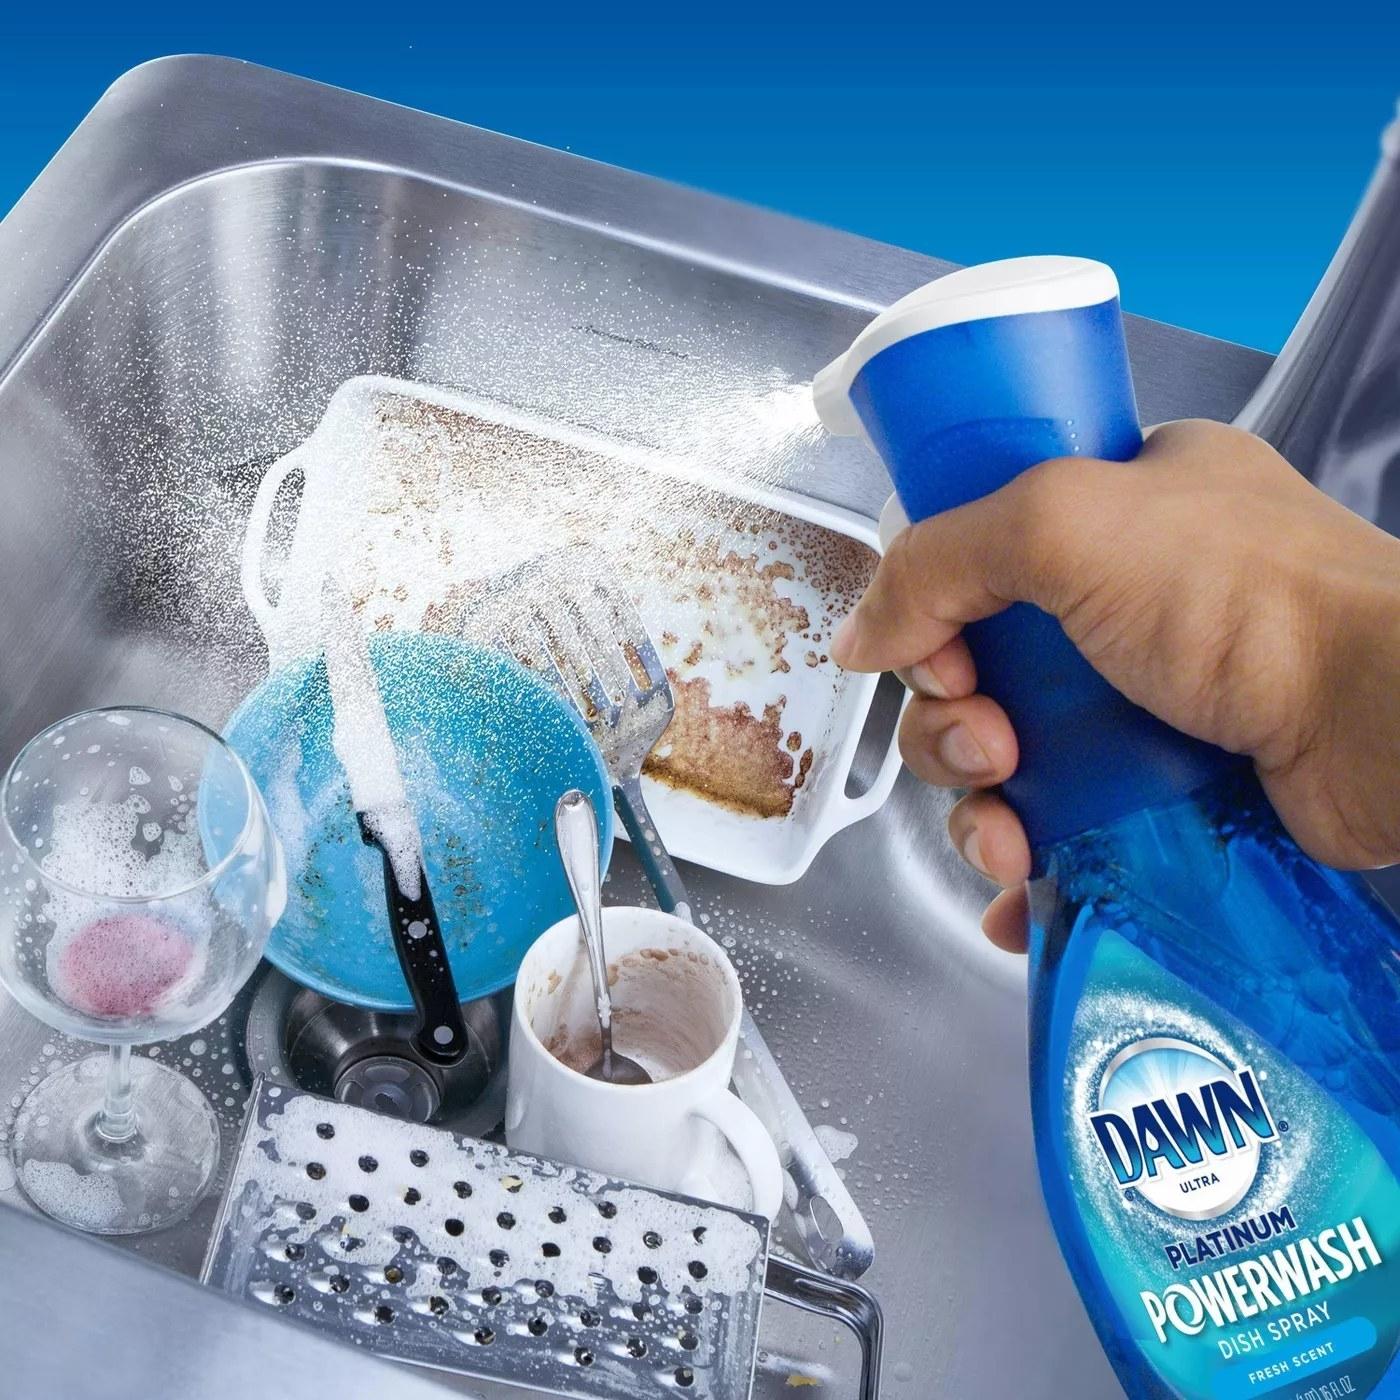 A model spraying Dawn's Platinum Powerwash Dish Spray on a sink full of dirty dishes